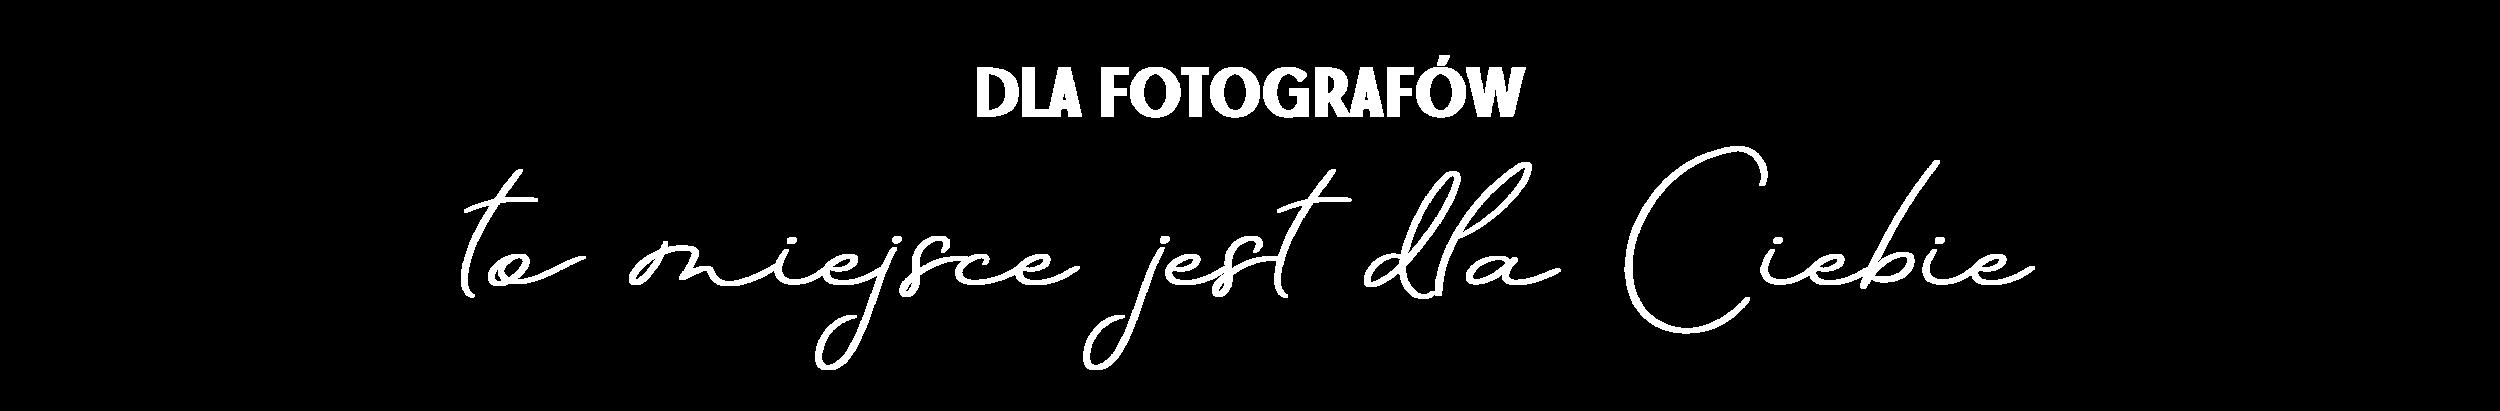 dla fotografow 2.png